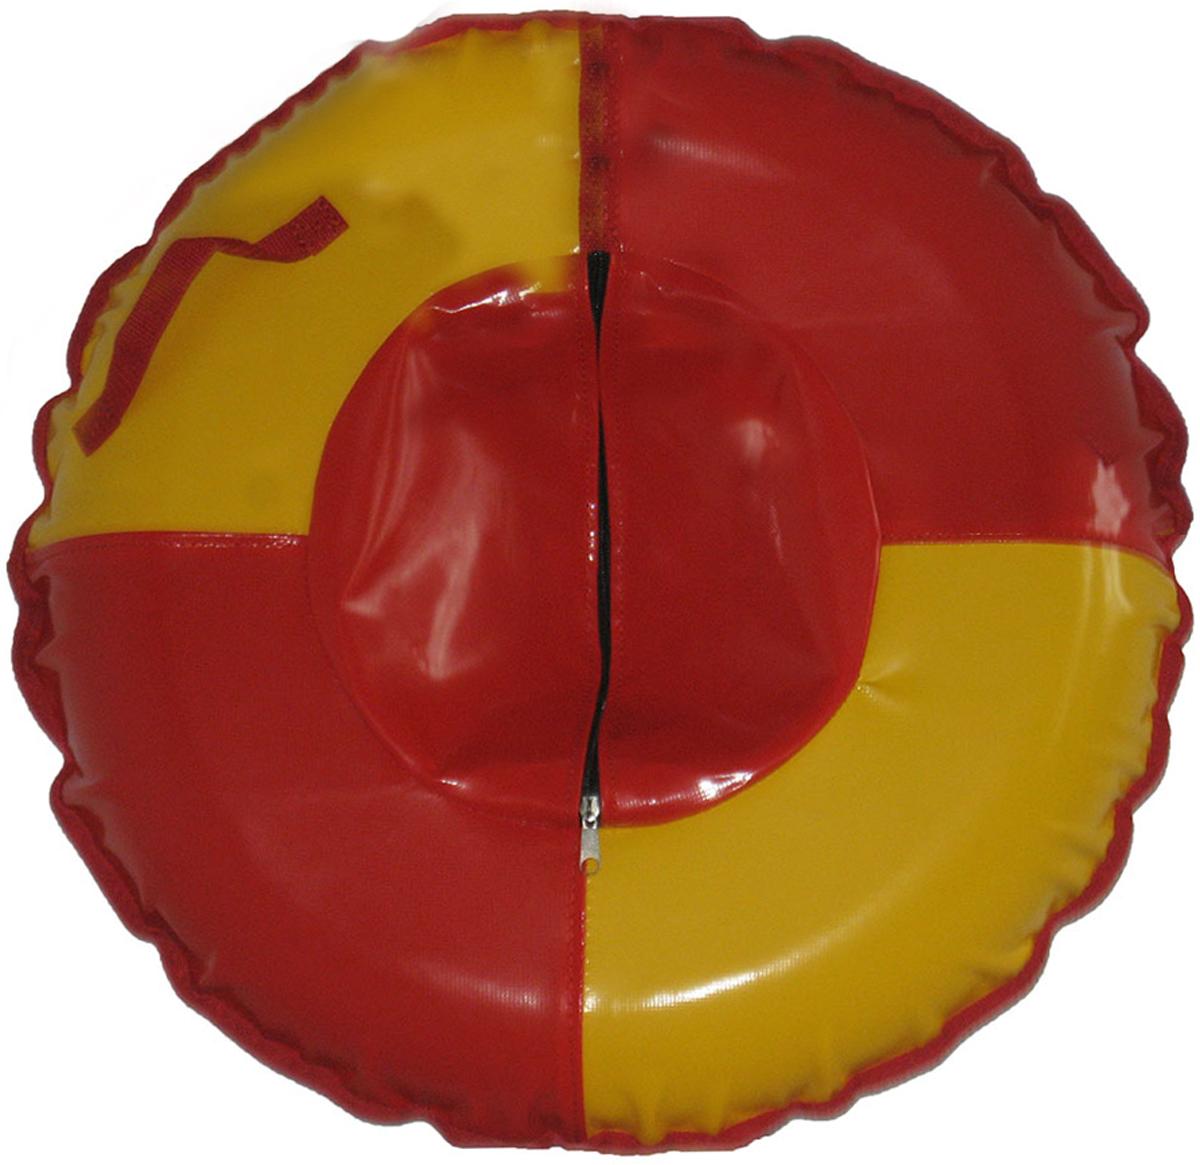 Тюбинг FormulaZima Вихрь, цвет: красный, желтый, диаметр 100 см тюбинг hubster ринг pro во4785 1 красный синий диаметр 90 см